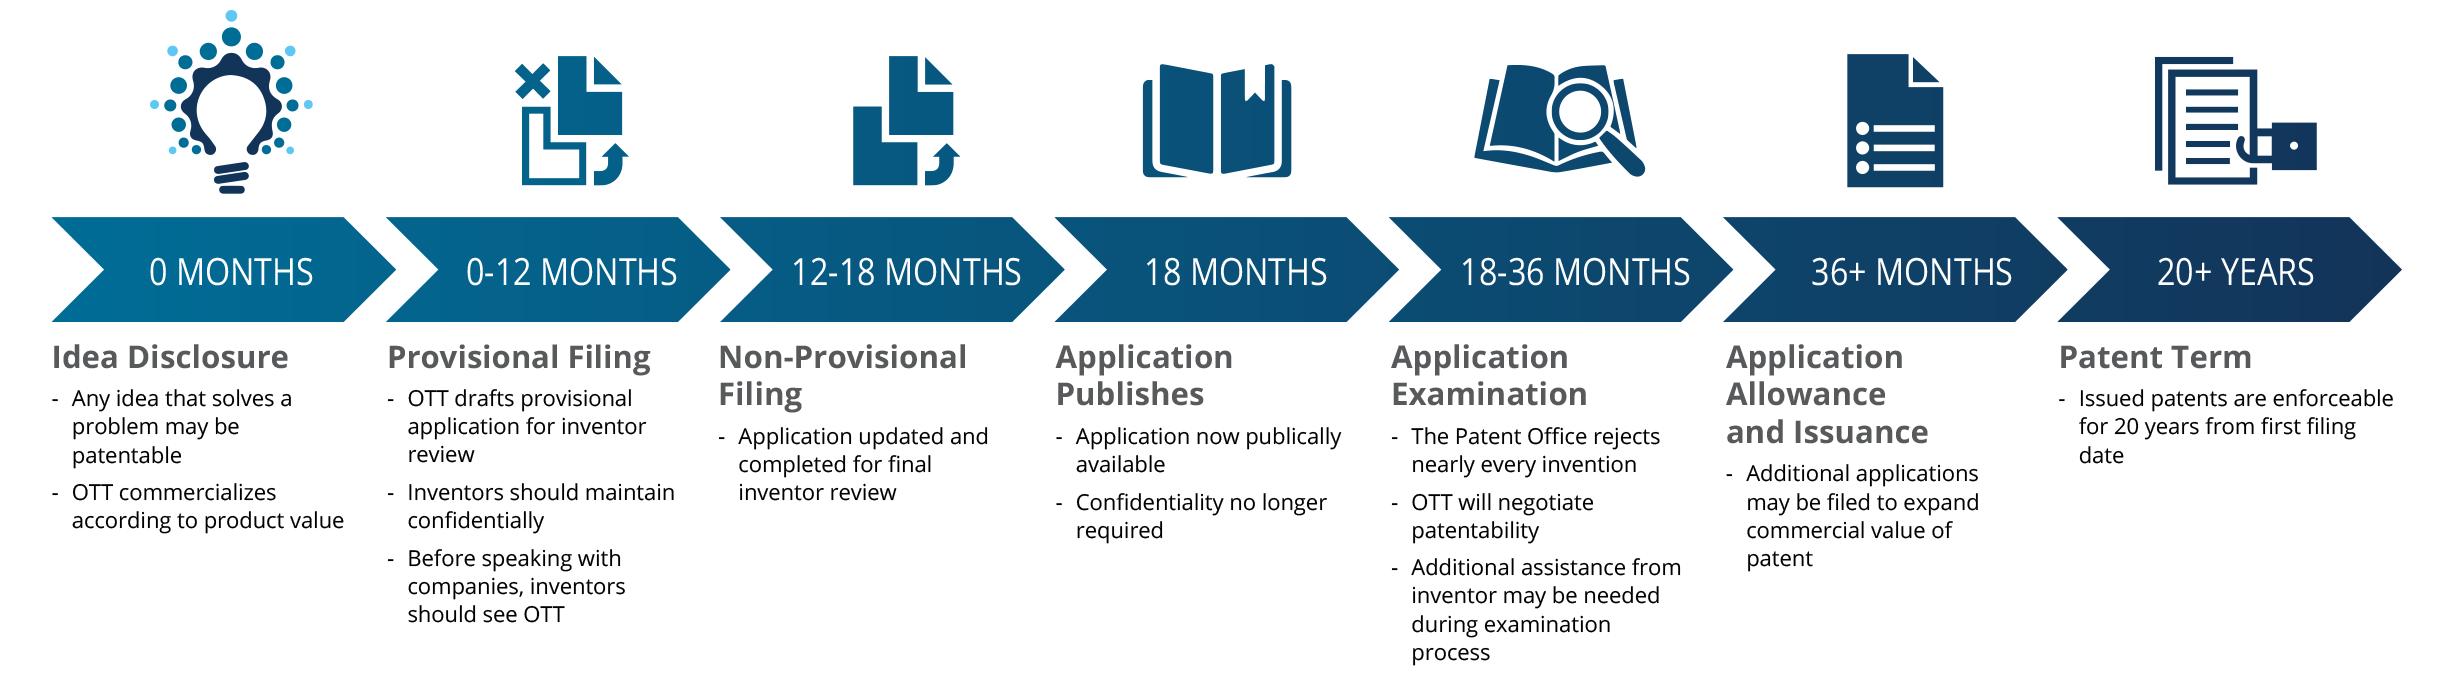 horizontal-patent-timeline